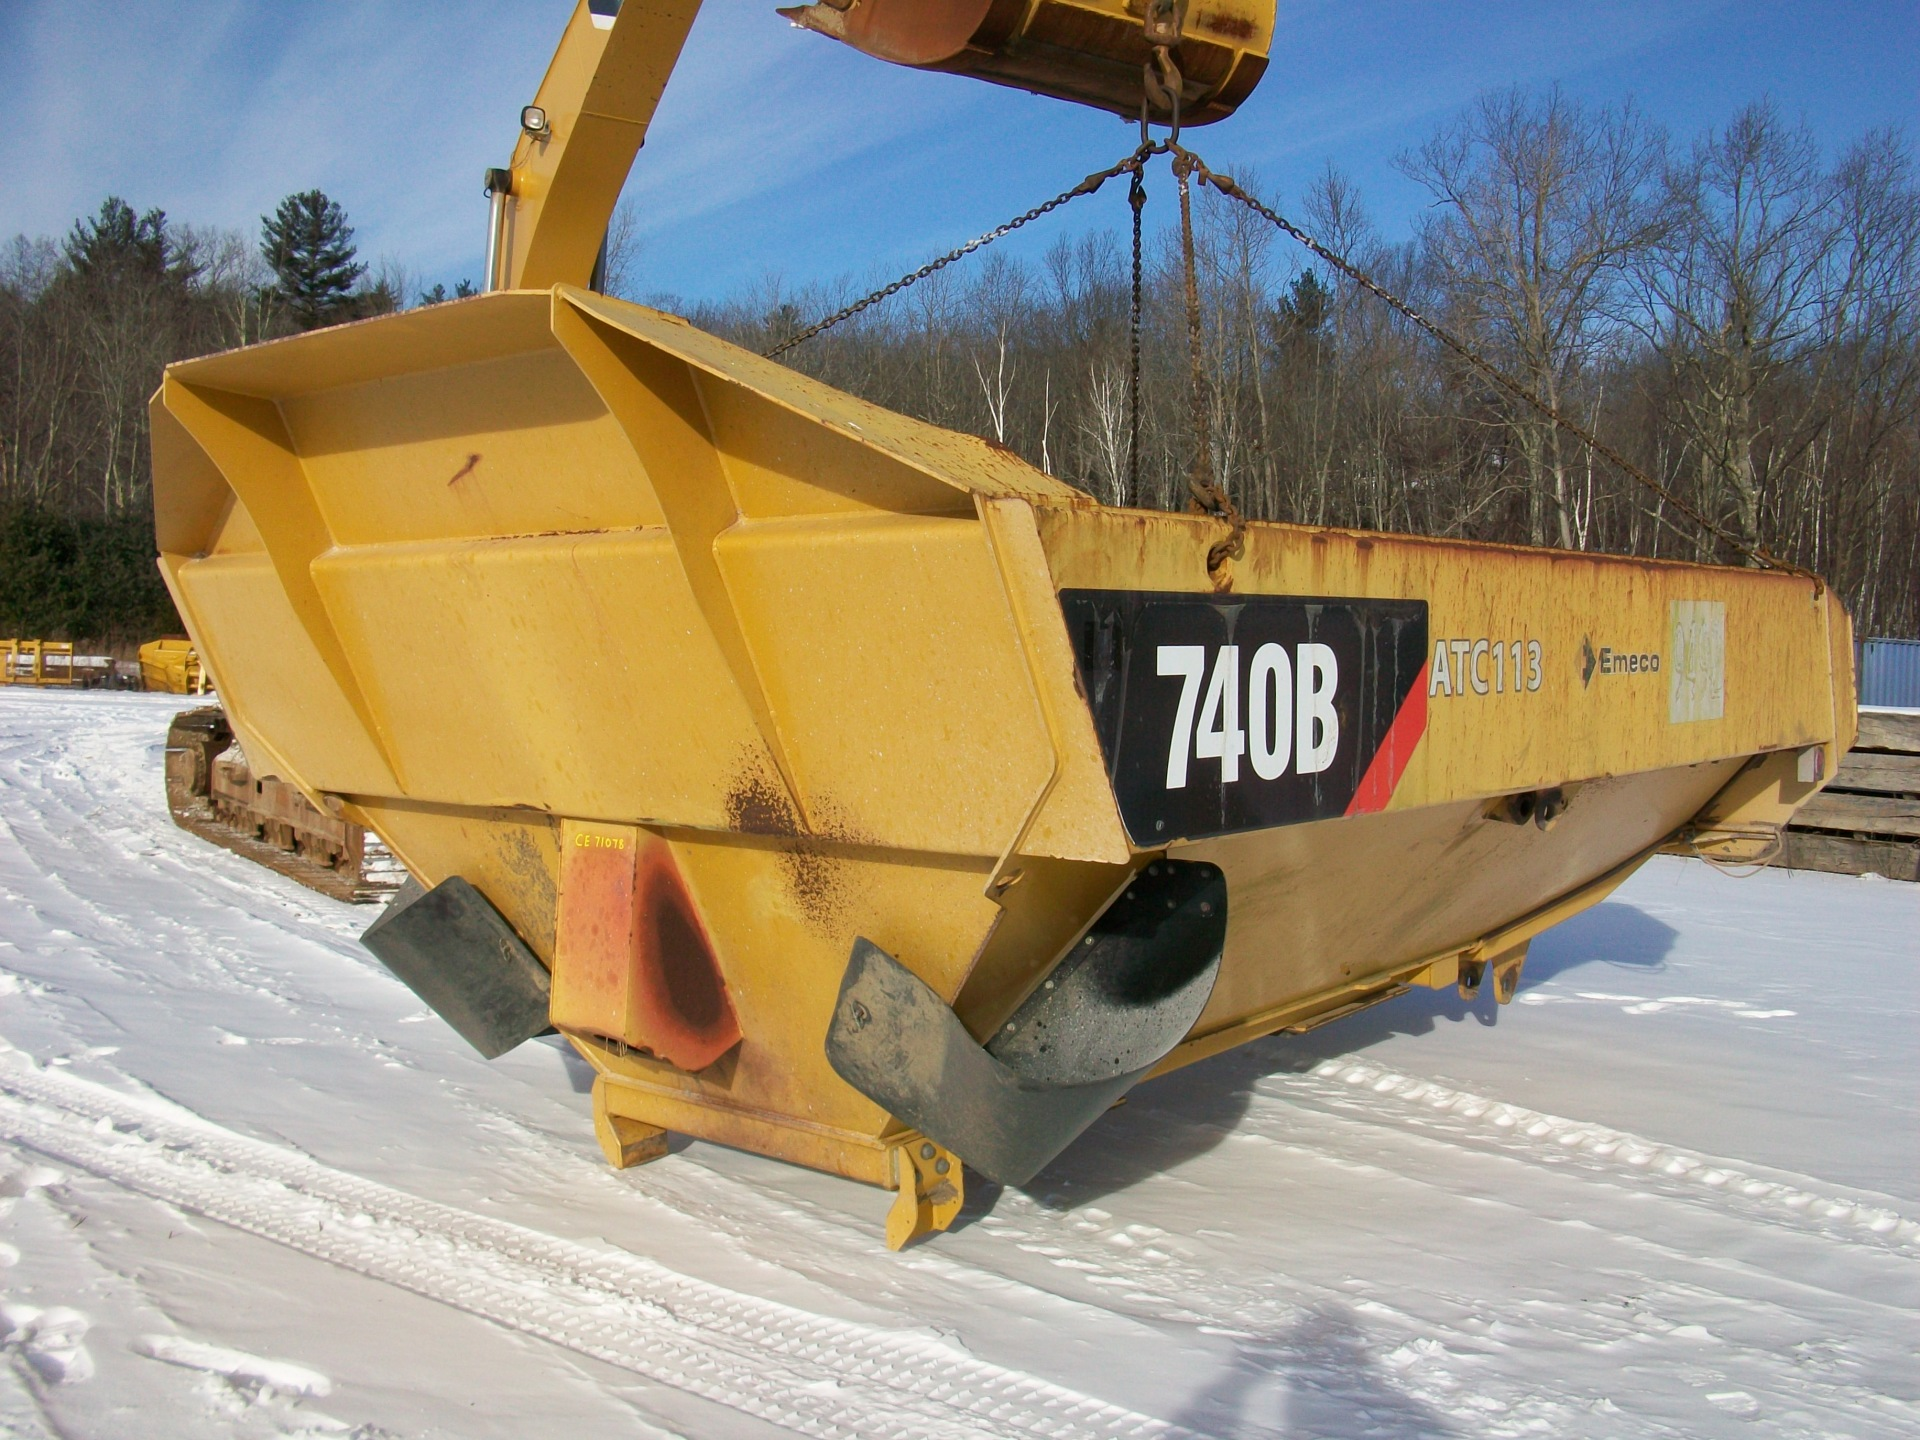 CAT 740B dump body, $8,000